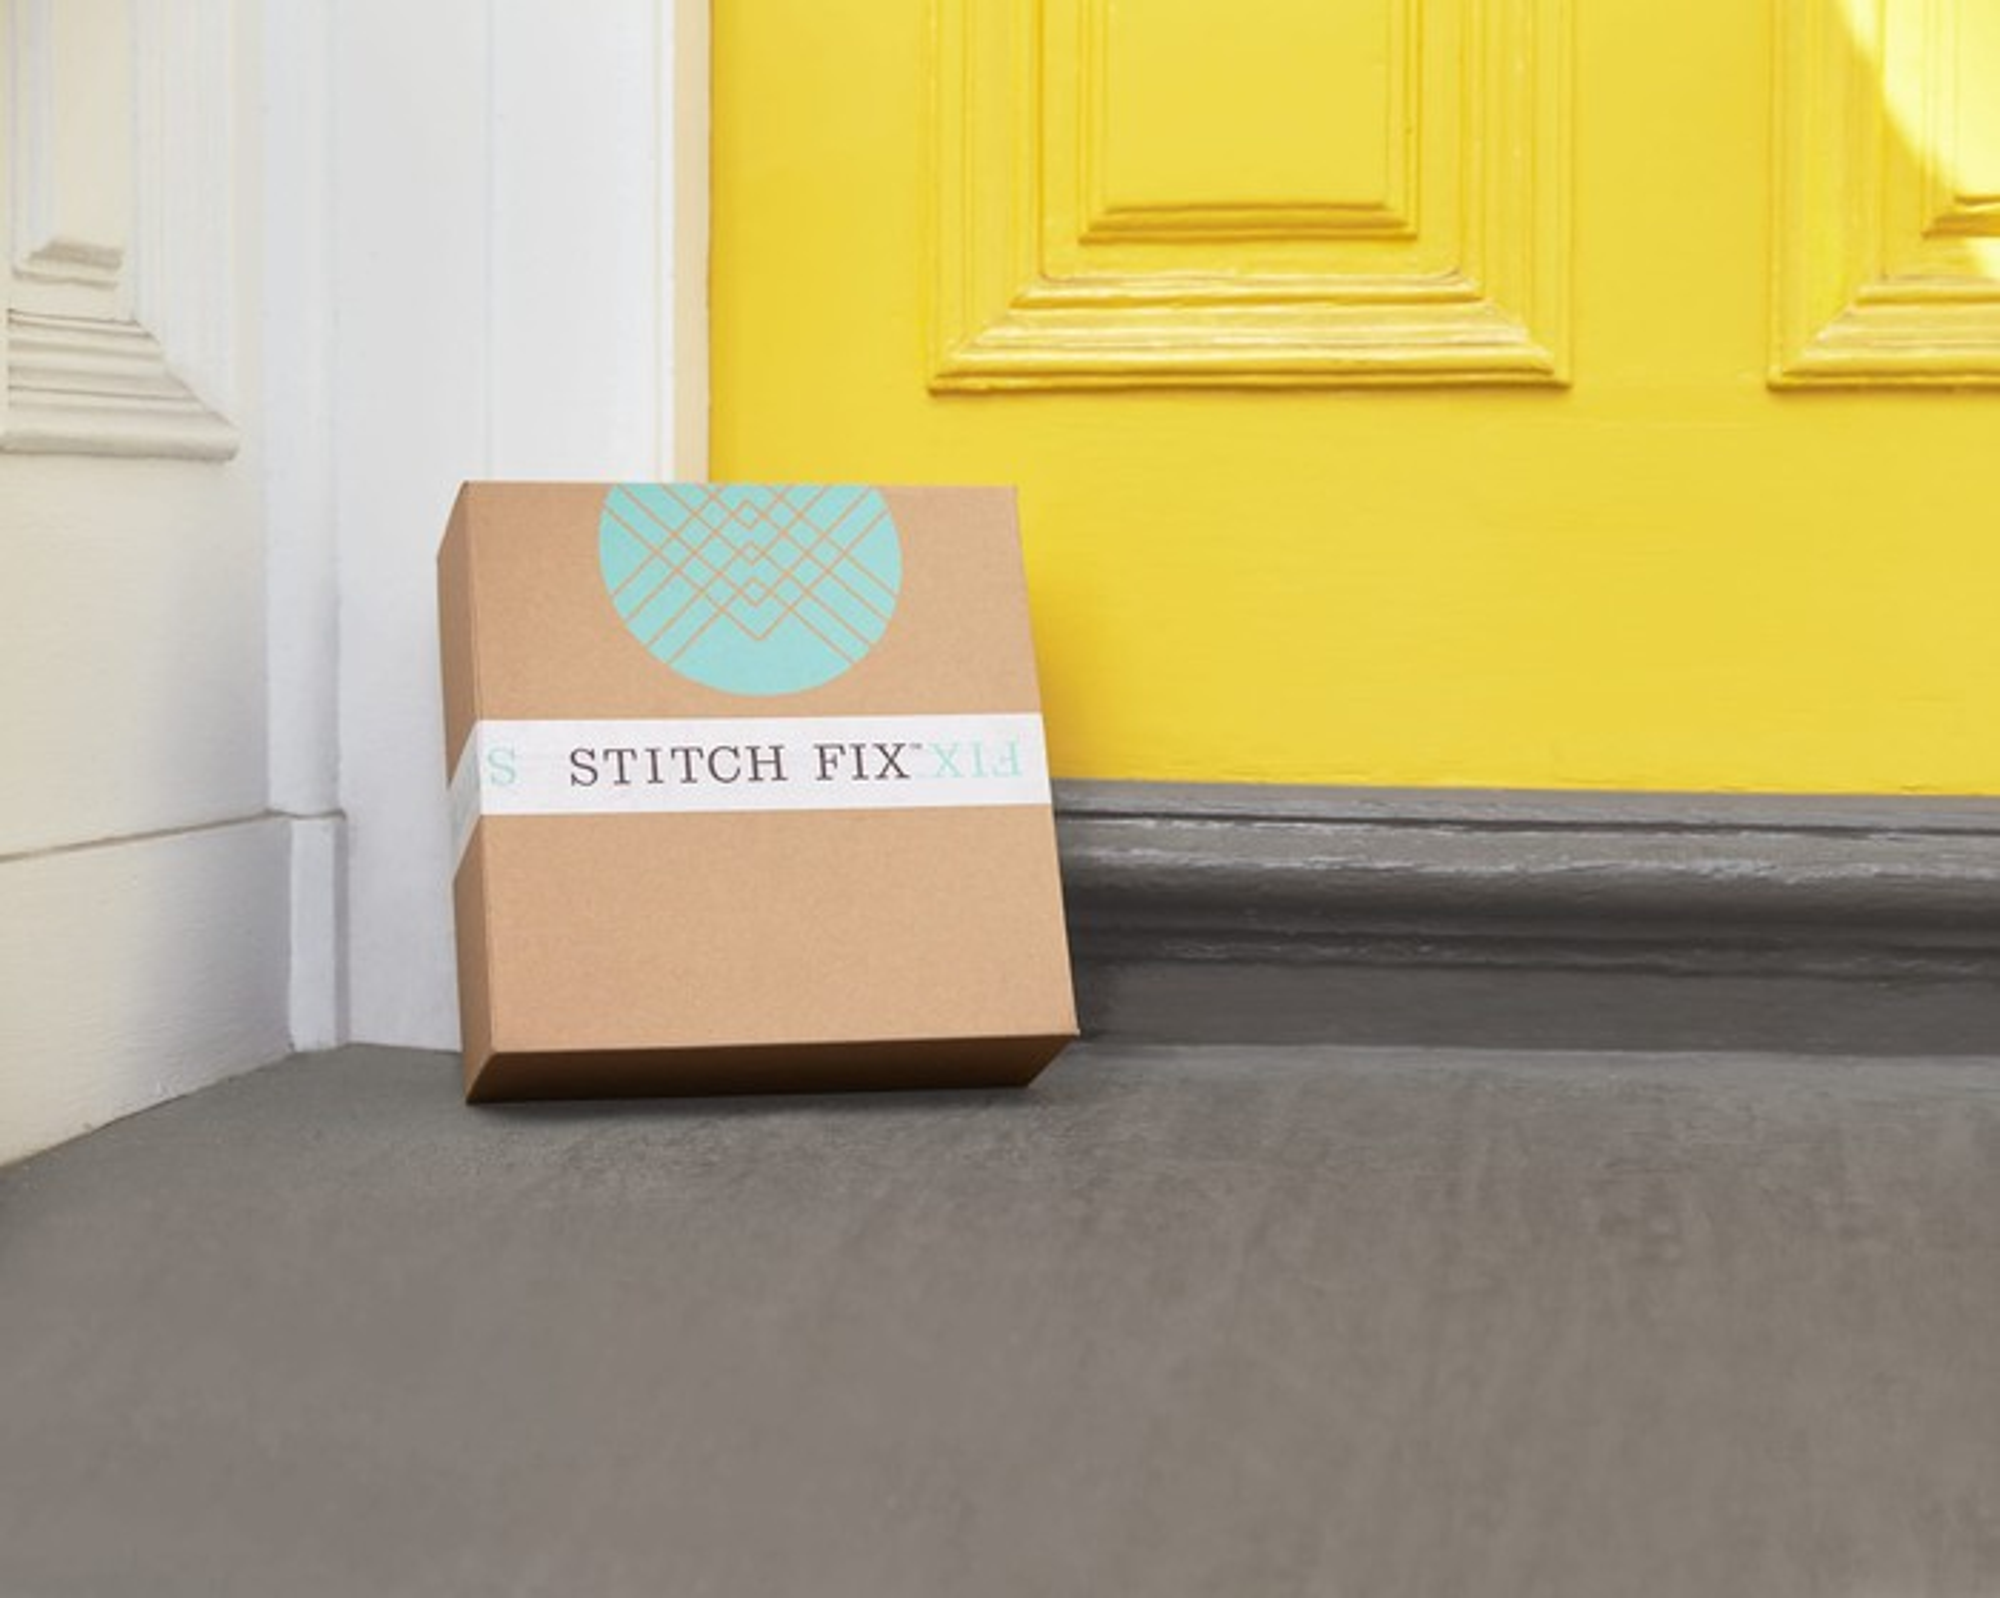 A Stitch Fix box against a bright yellow door